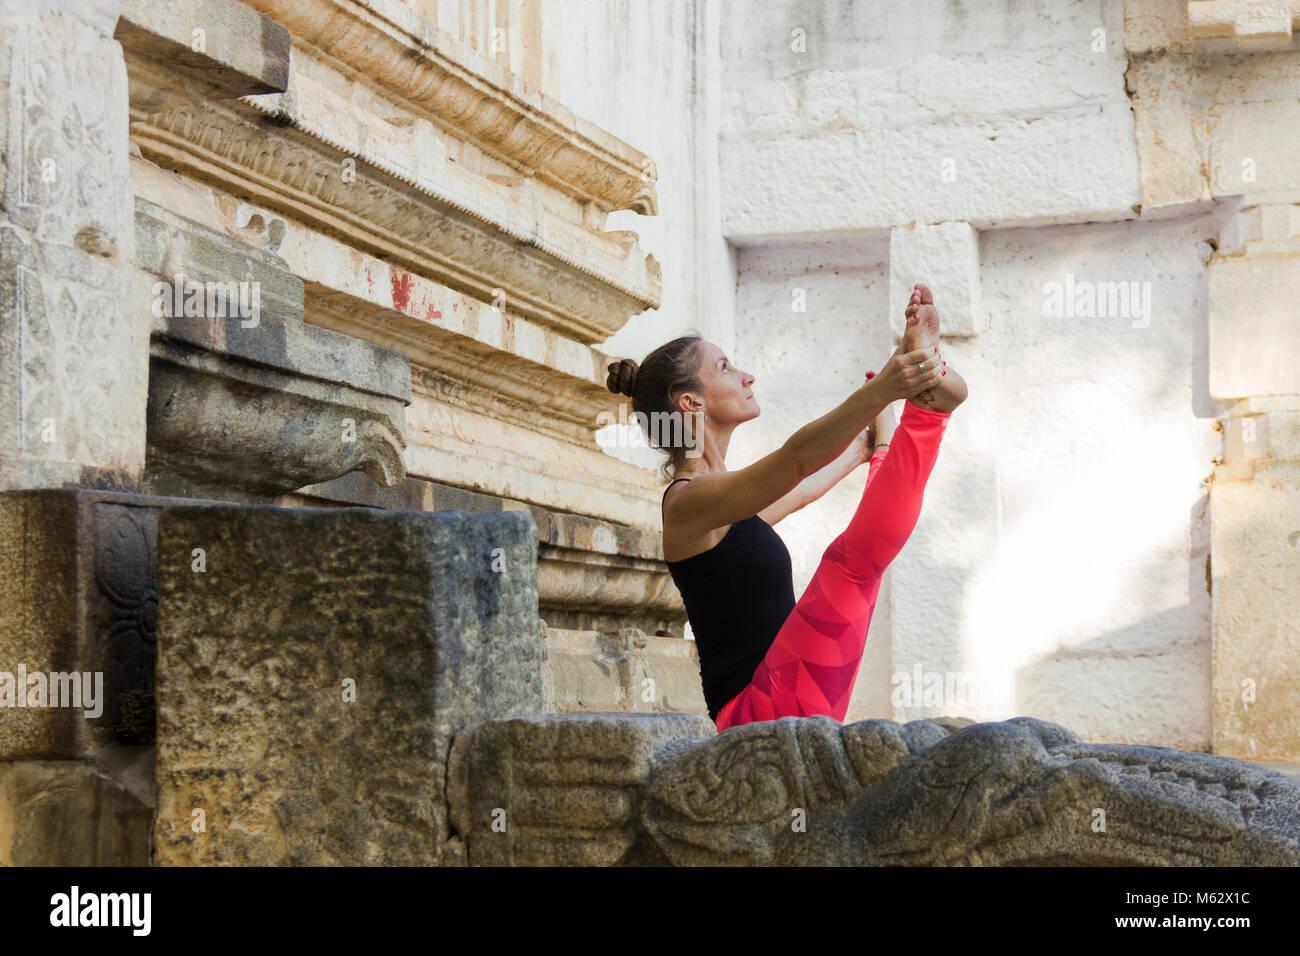 Yogi woman in upavistha konasana with pink leggings in Srirangapatna temple, Karnataka, India. Yoga teacher practicing Stock Photo